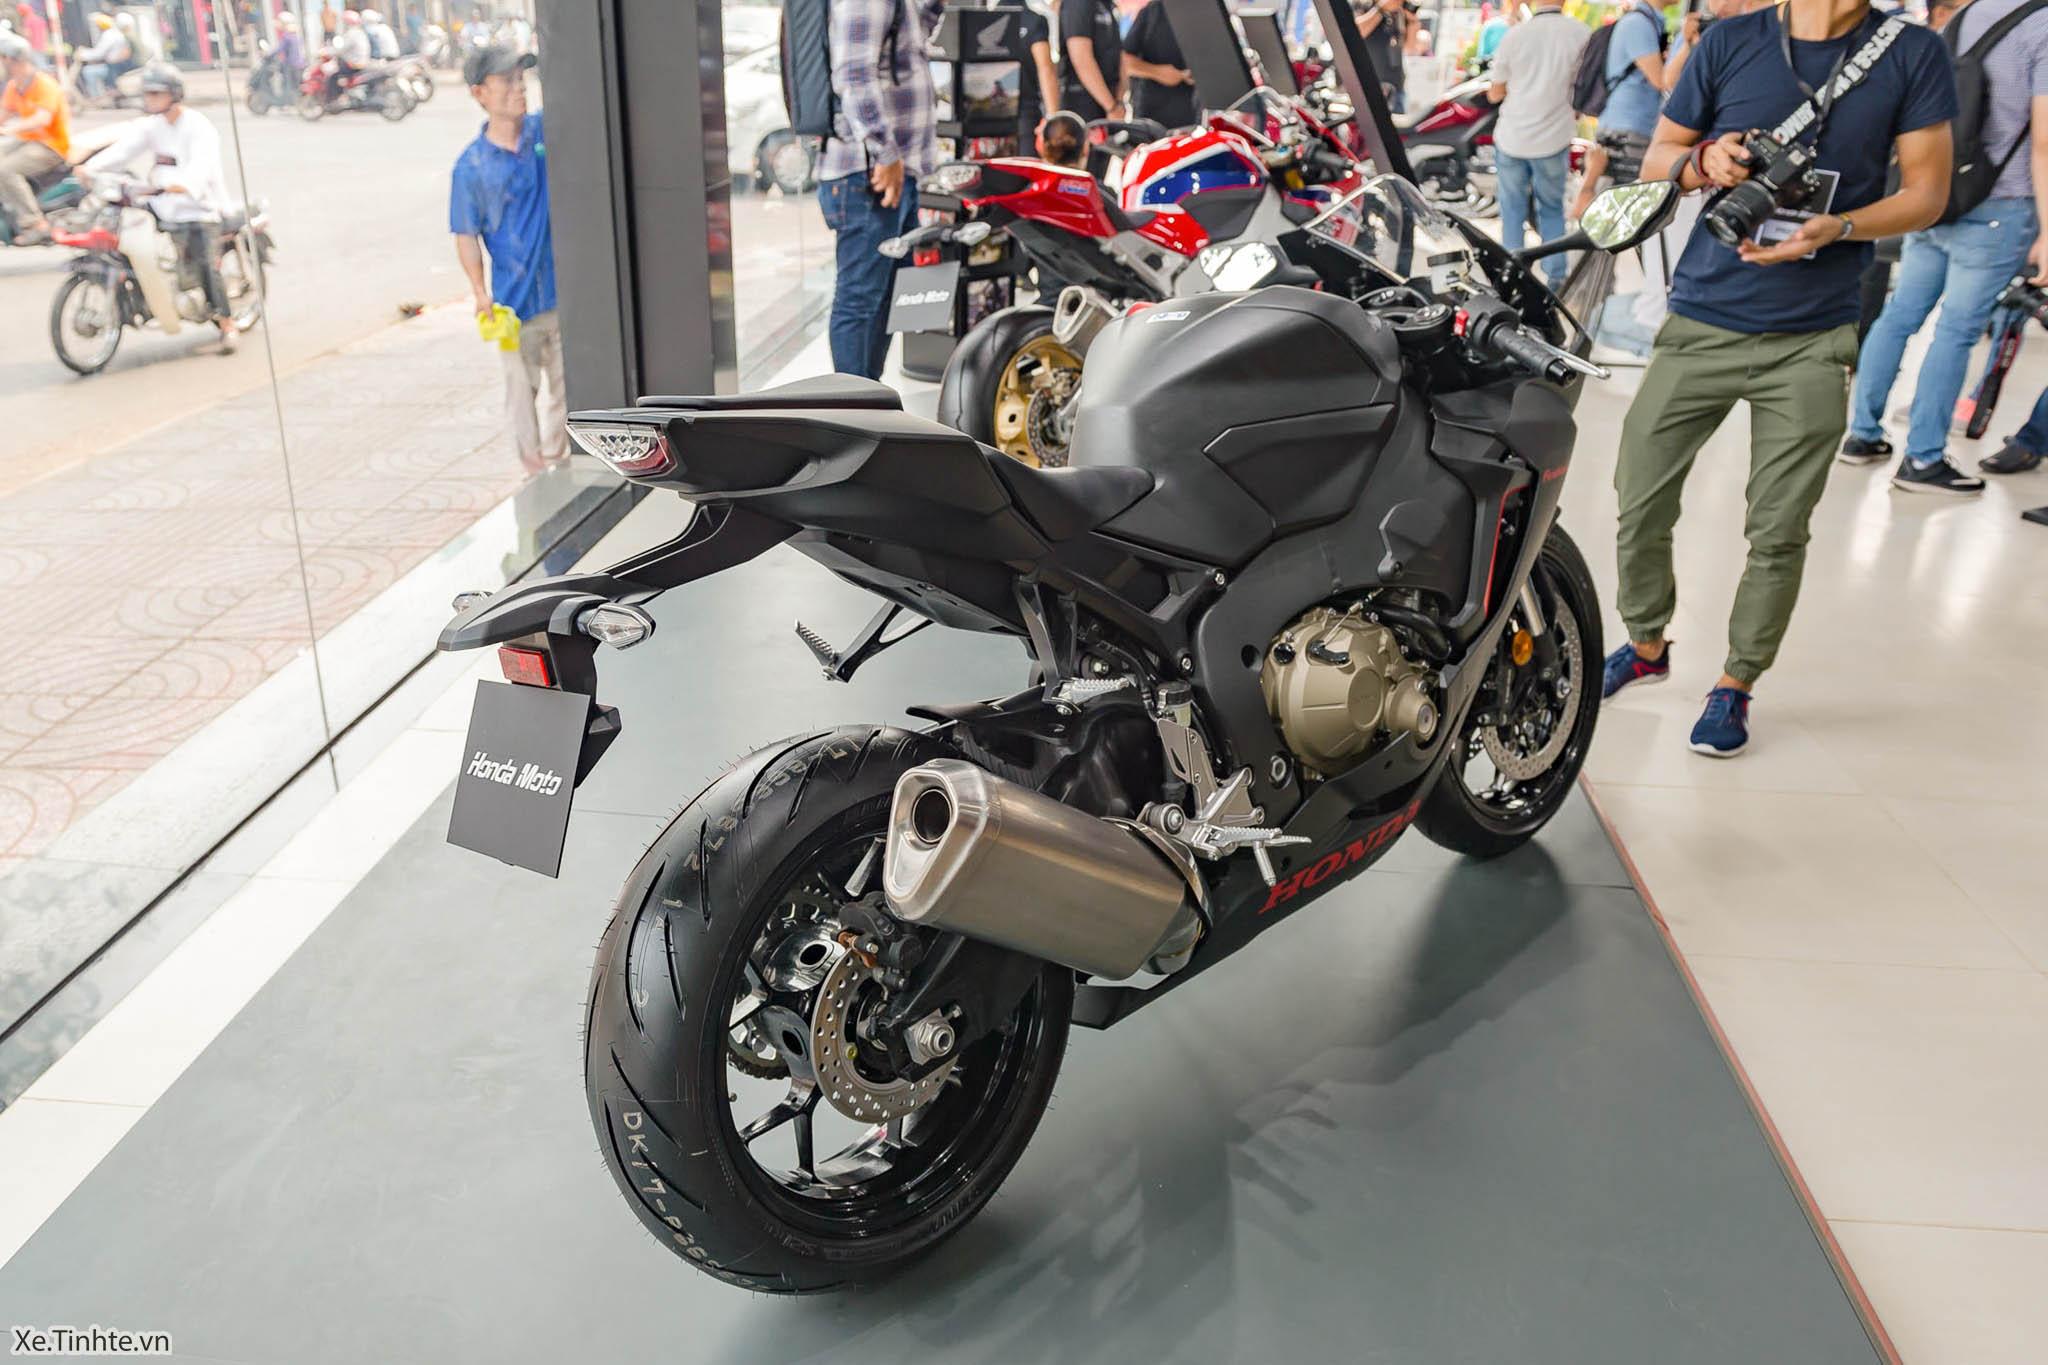 Honda_moto_Honda_CBR1000RR_Xe_Tinhte (1).JPG